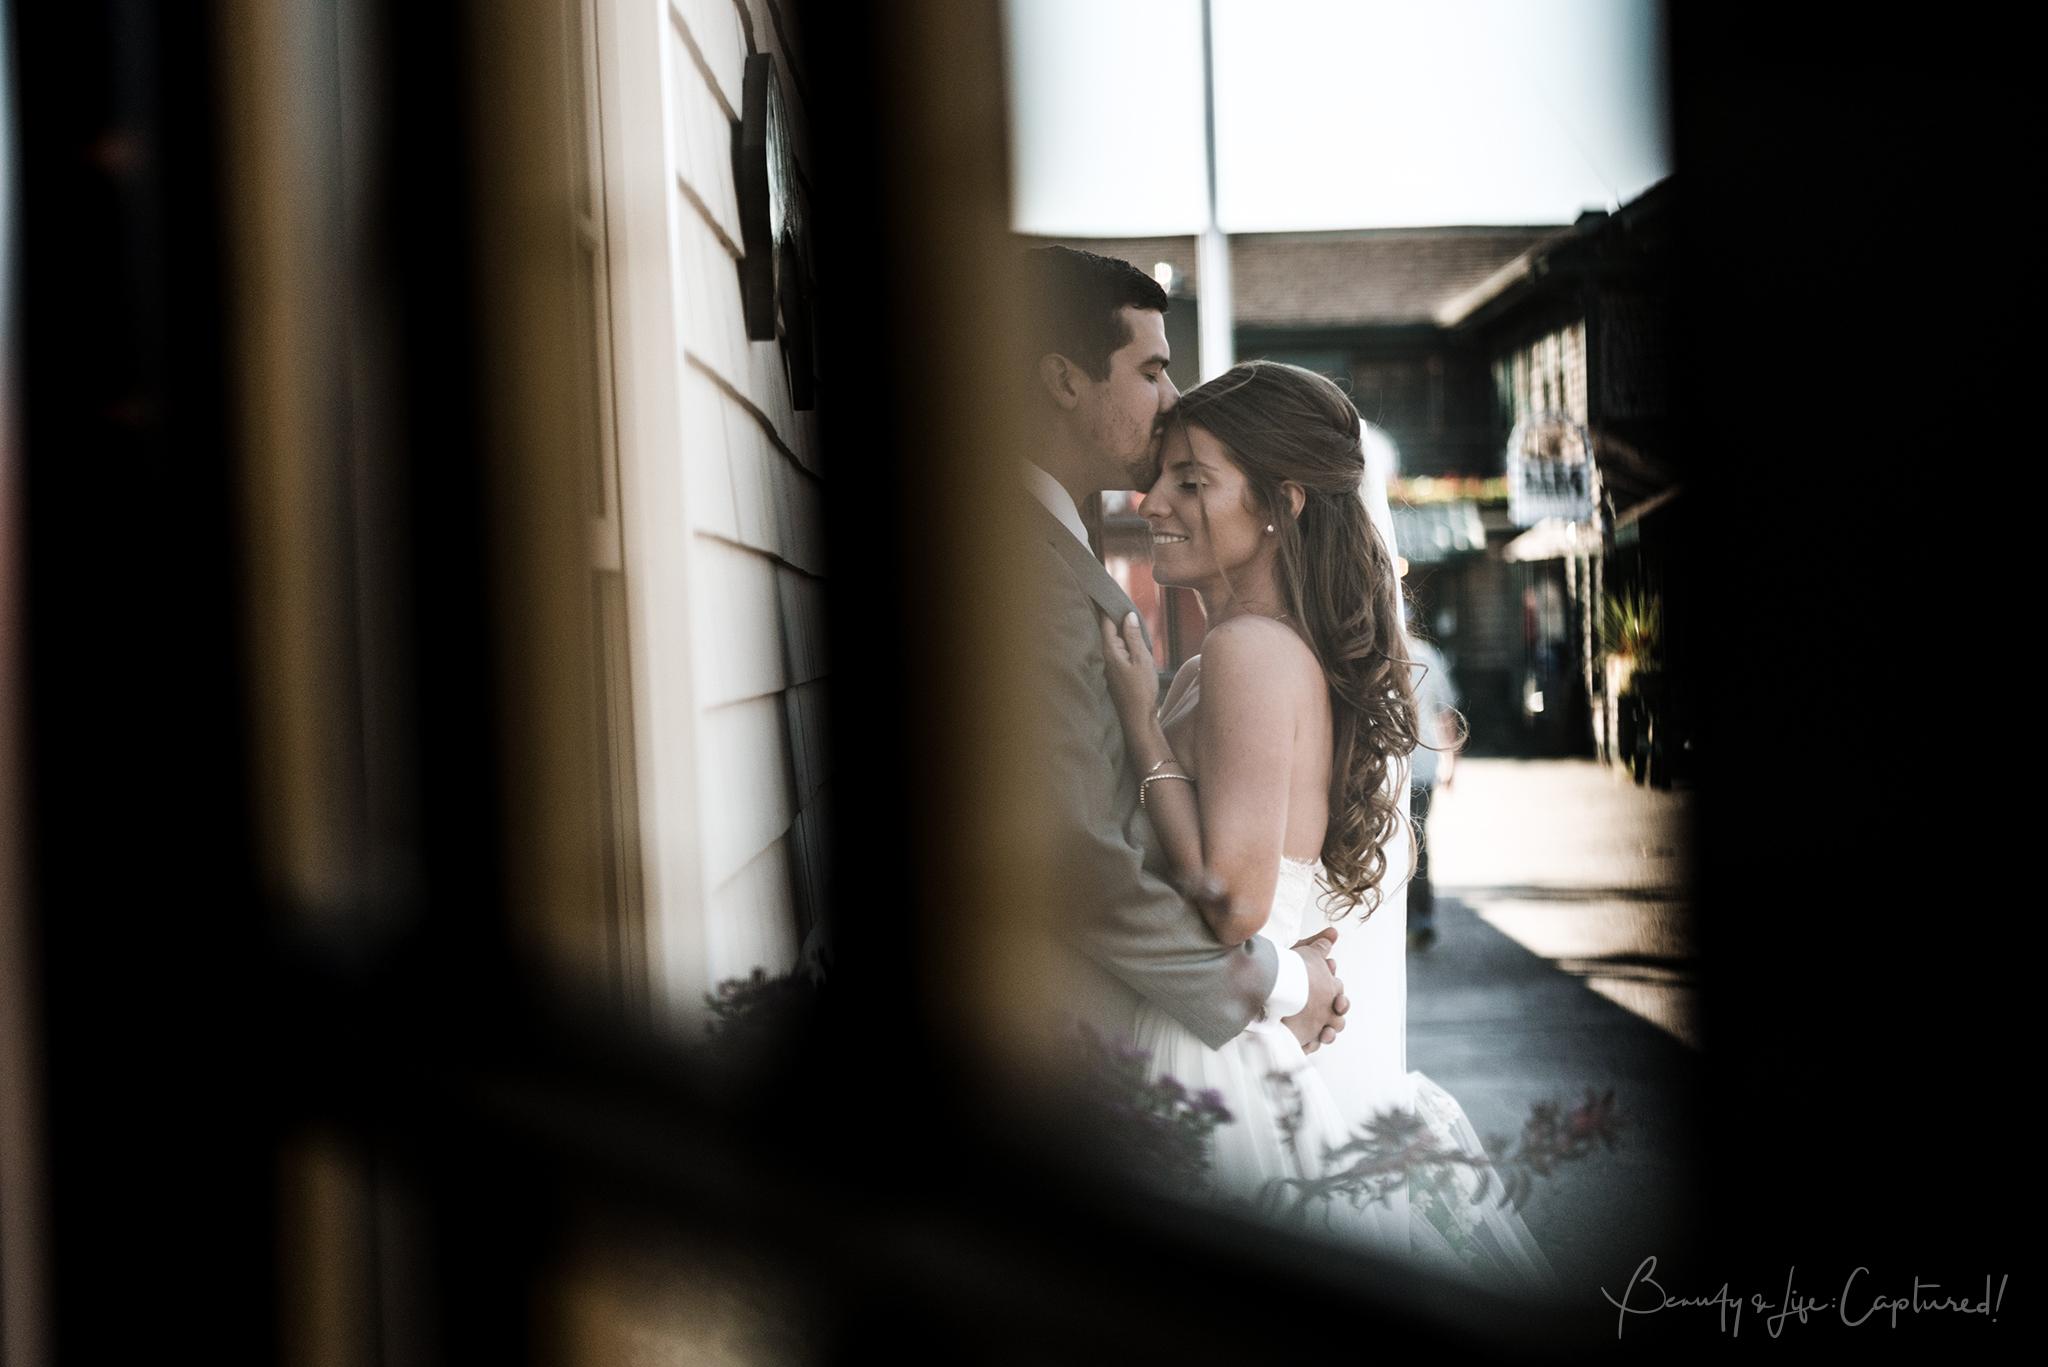 Beauty_and_Life_Captured_Athena_Wedding-13.jpg